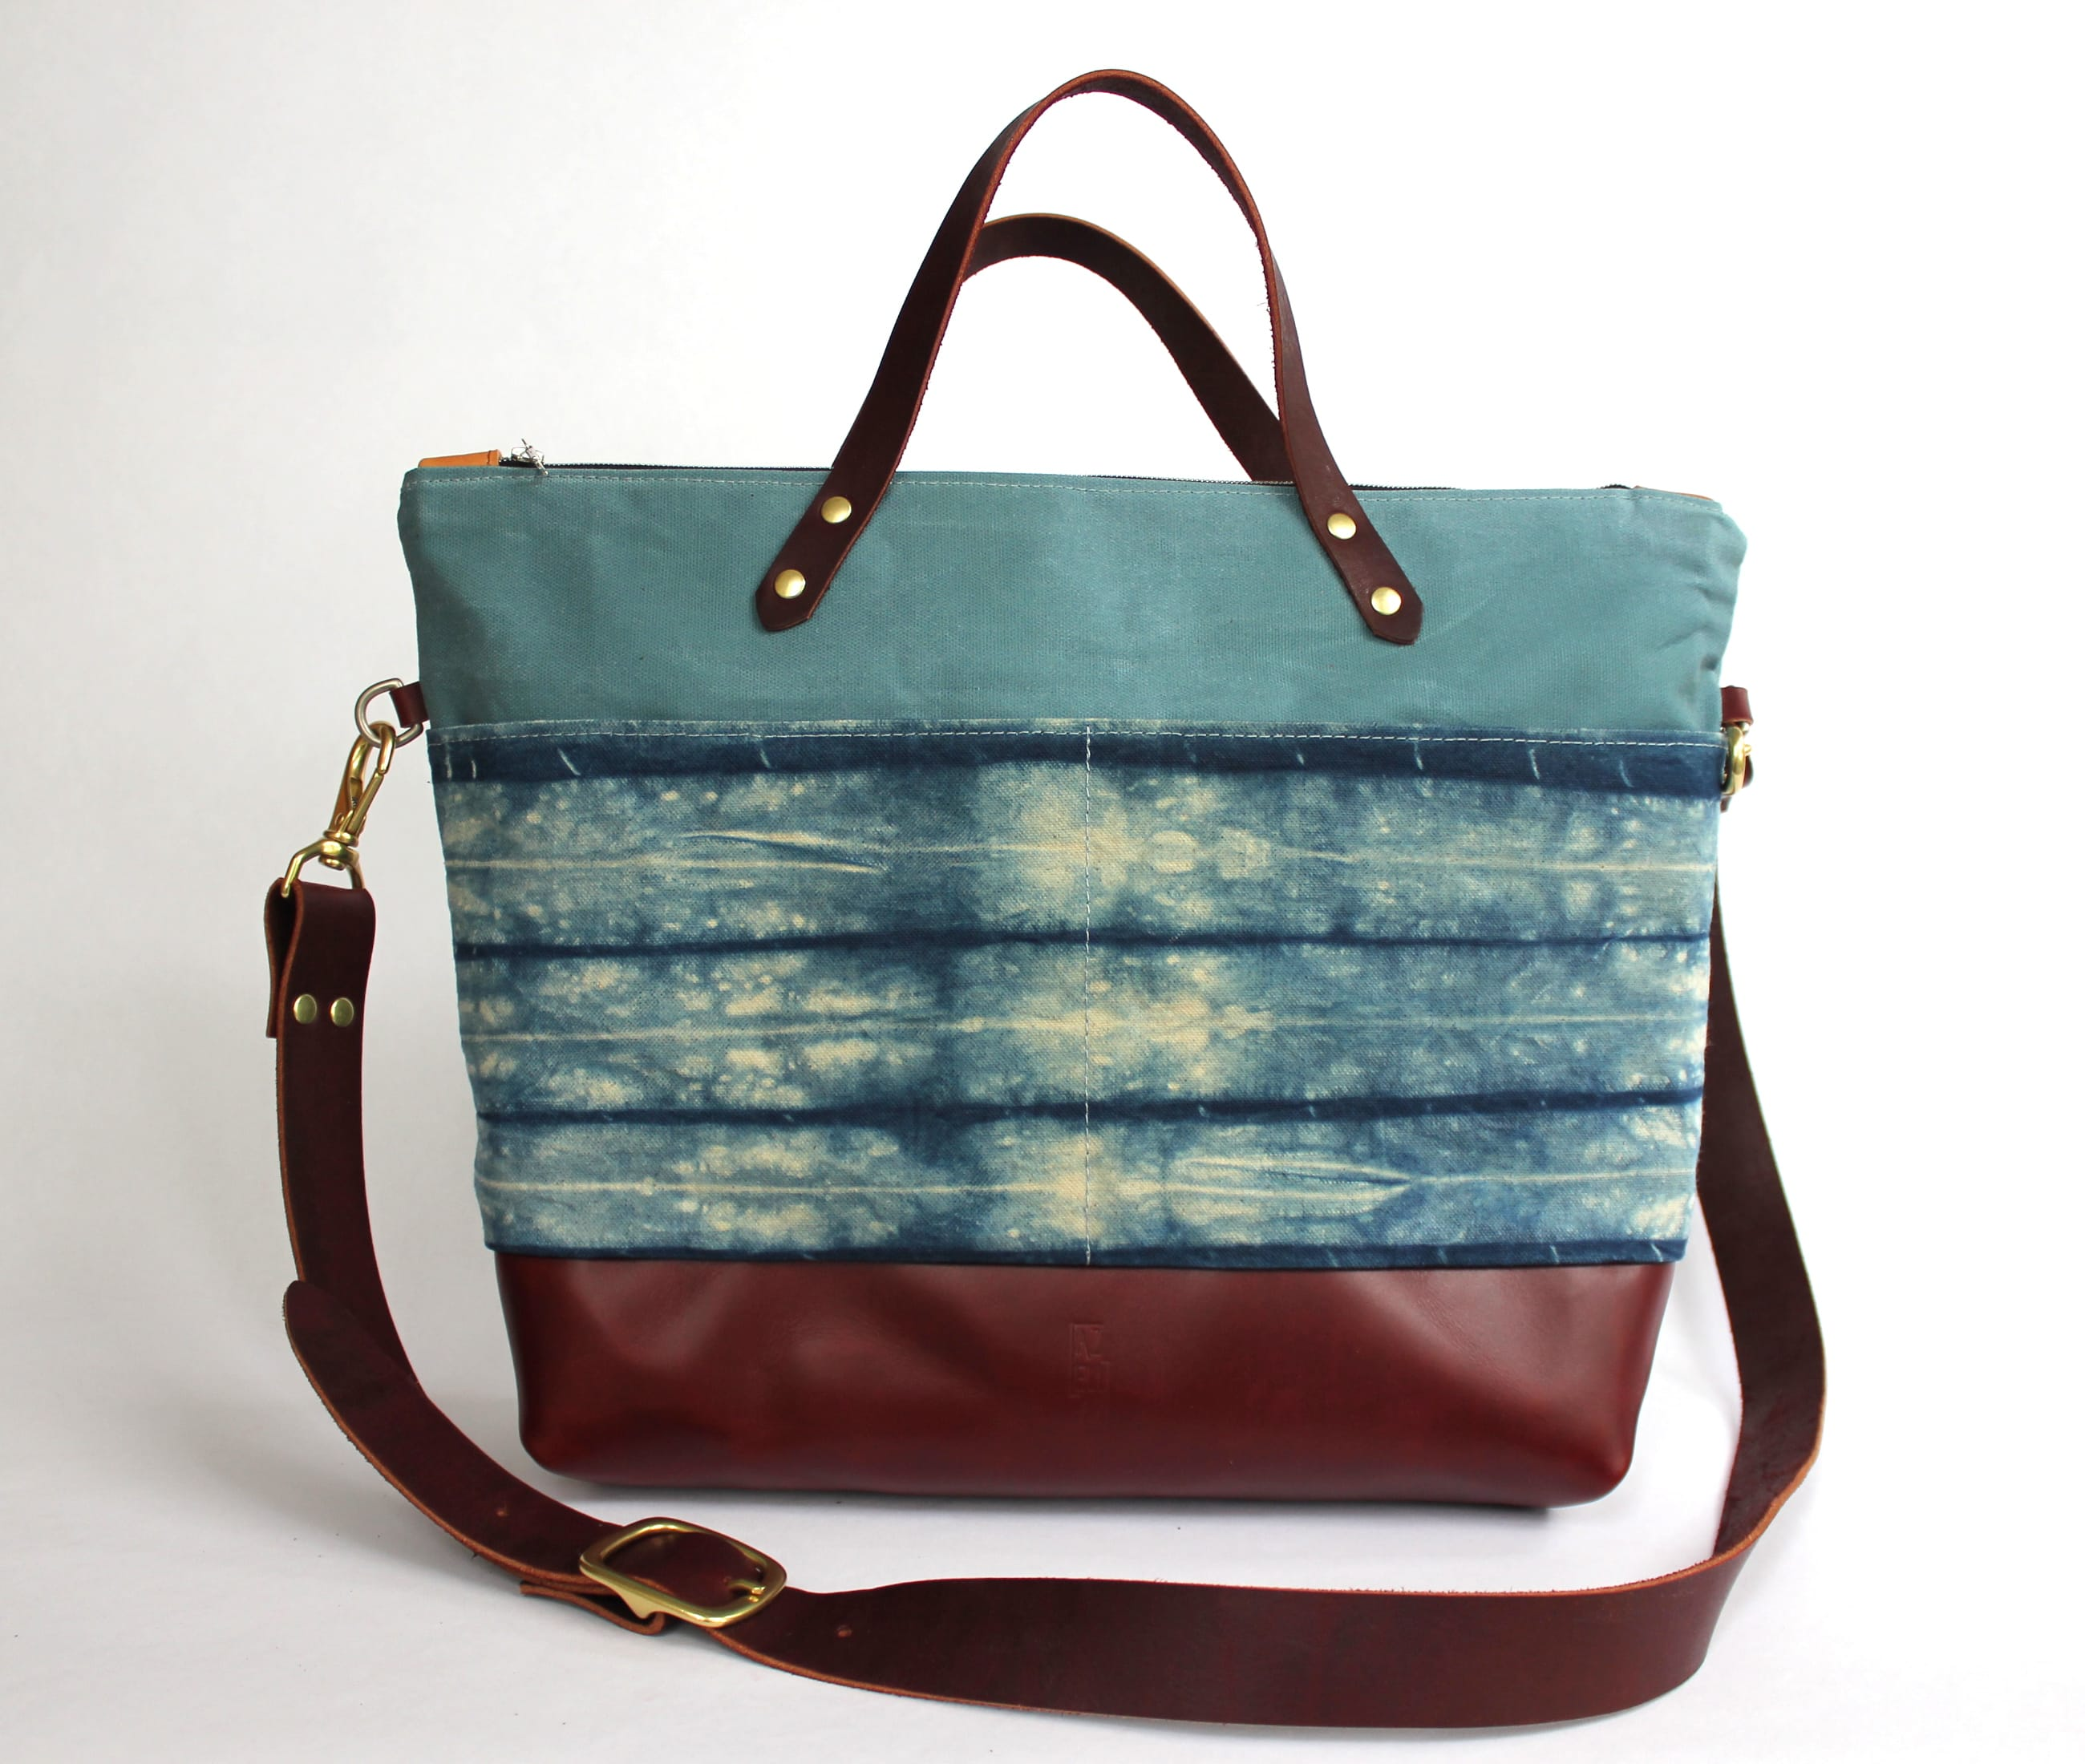 Medium tote indigo shibori natural maroon leather front by Azellaz